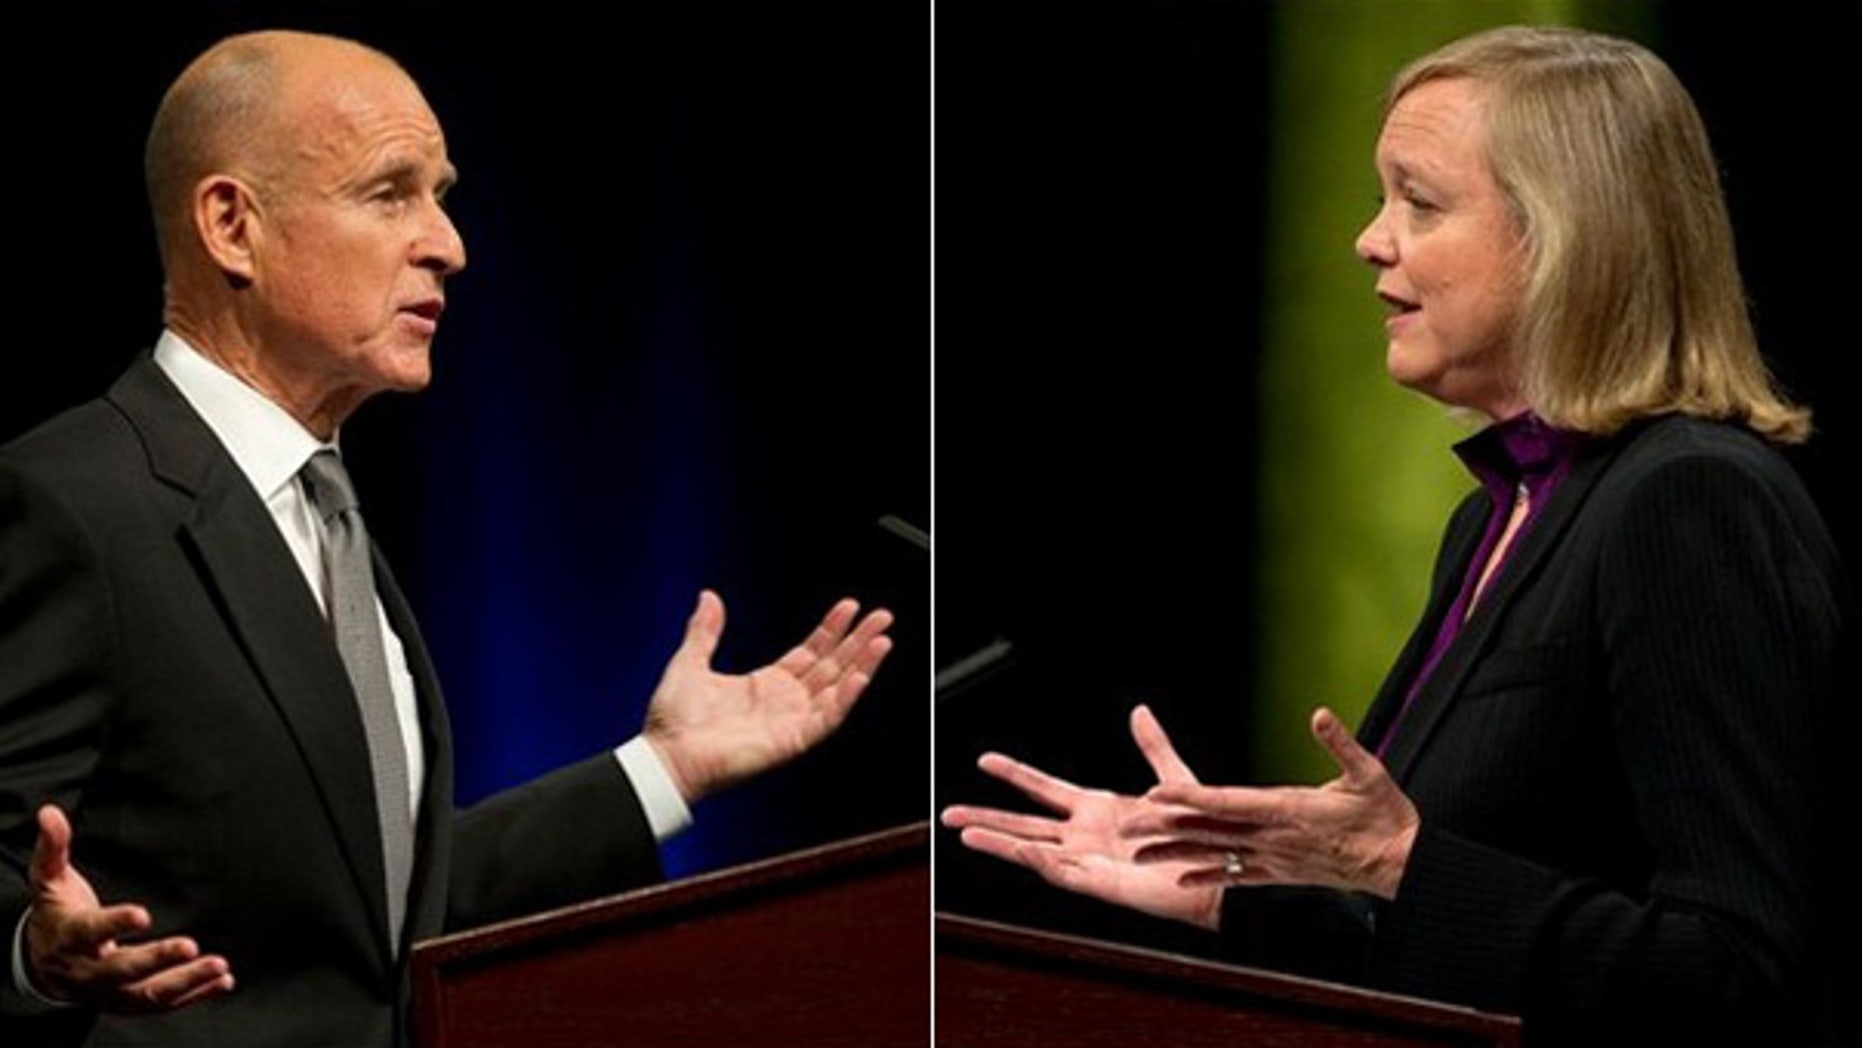 Sept. 28: Democratic gubernatorial candidate Jerry Brown, left, debates Republican Meg Whitman at the Univ. of California at Davis.